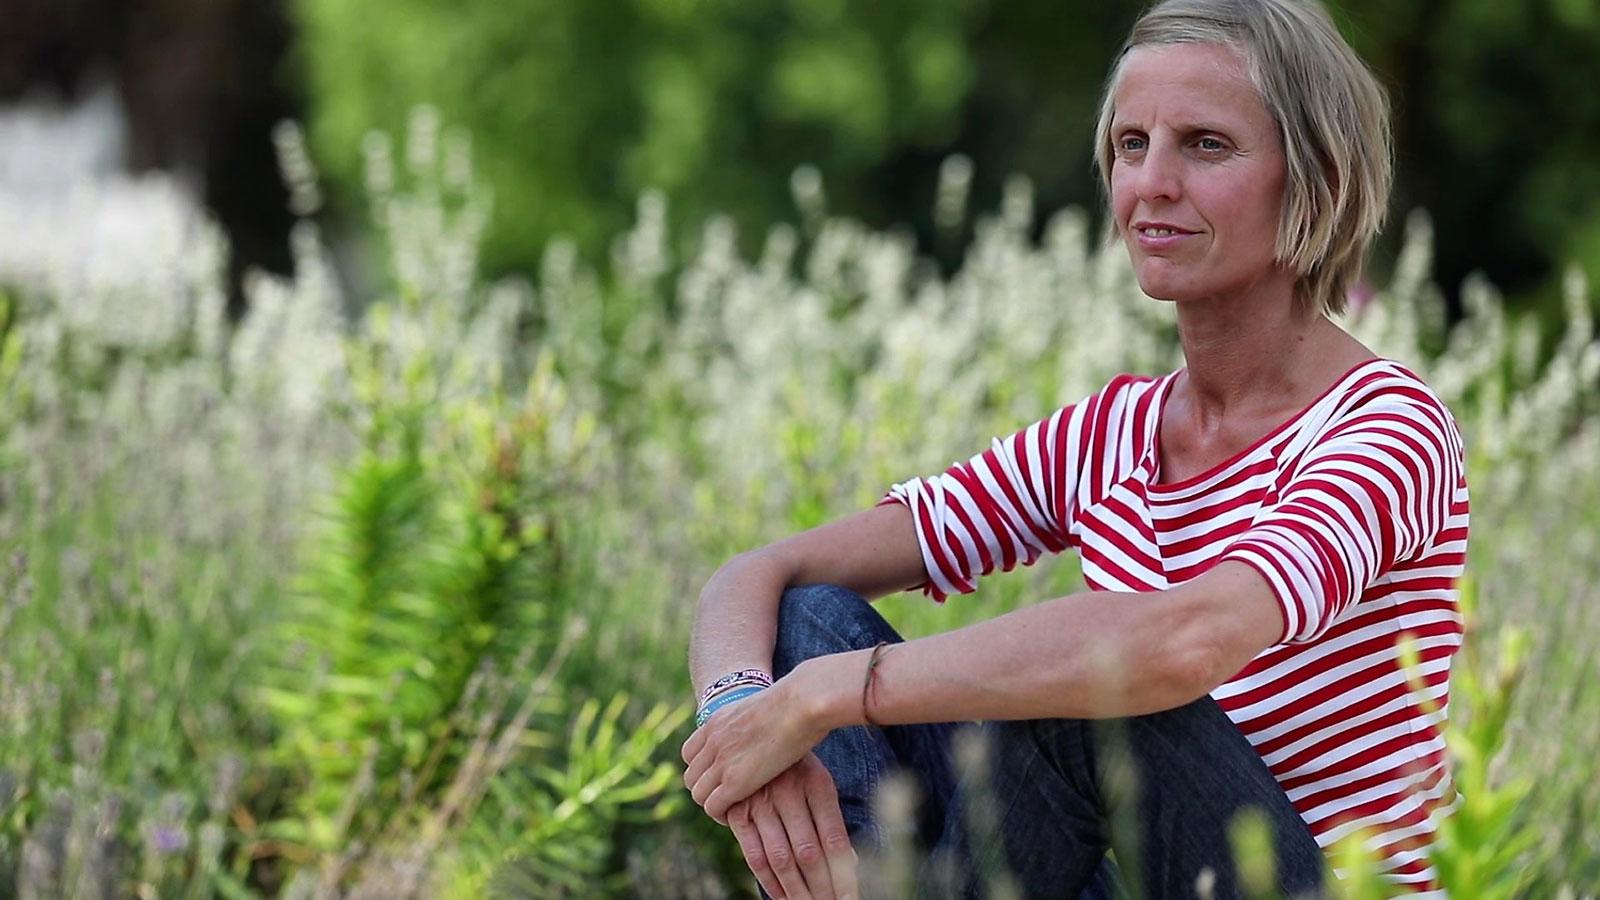 Karin Gümmer - Mama Coaching - Wie geht es dir gerade?